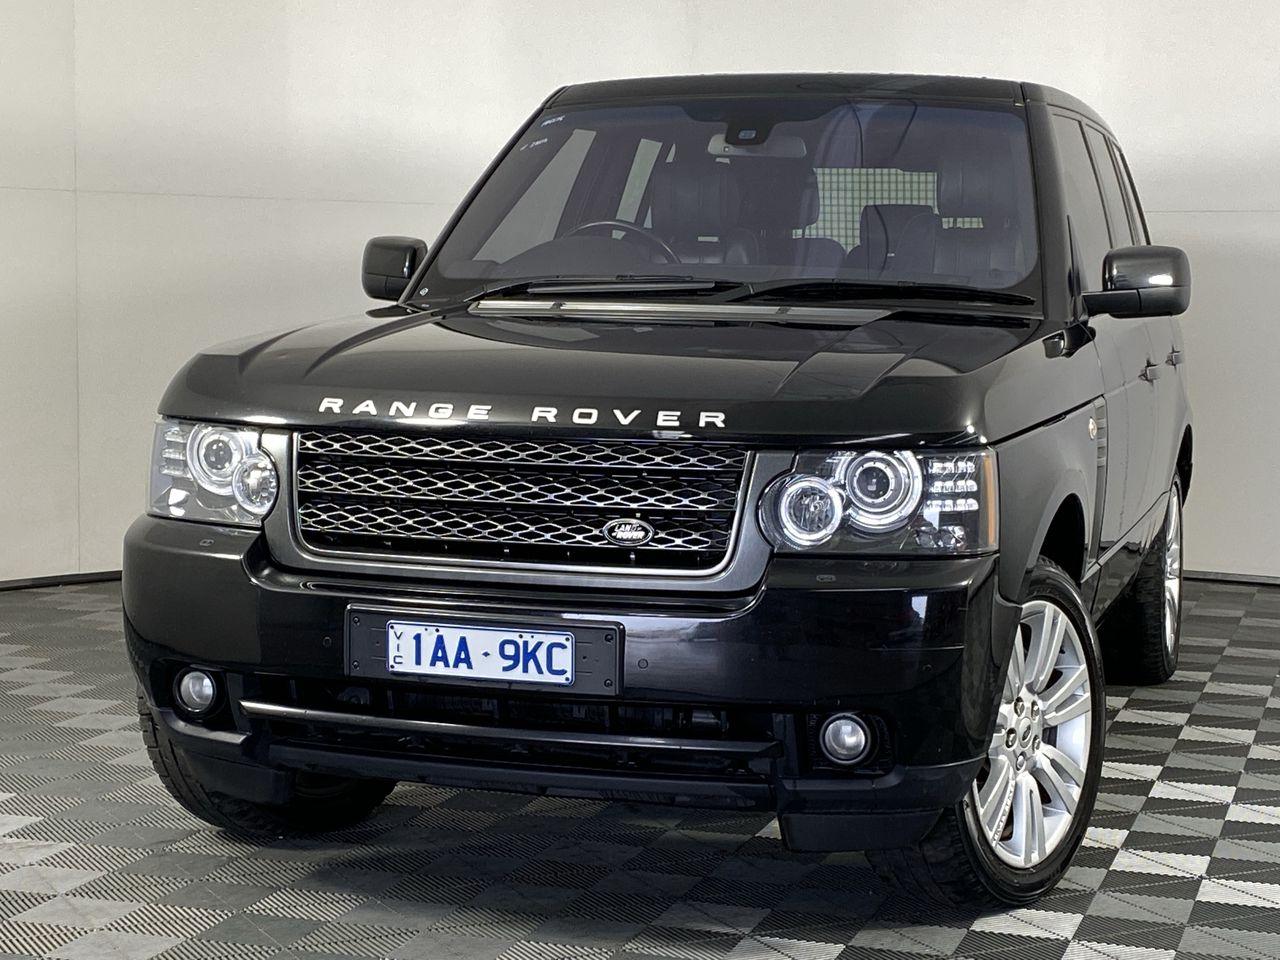 2011 Land Rover Range Rover Vogue TDV8 Luxury T/D Auto 8 Speed Wagon